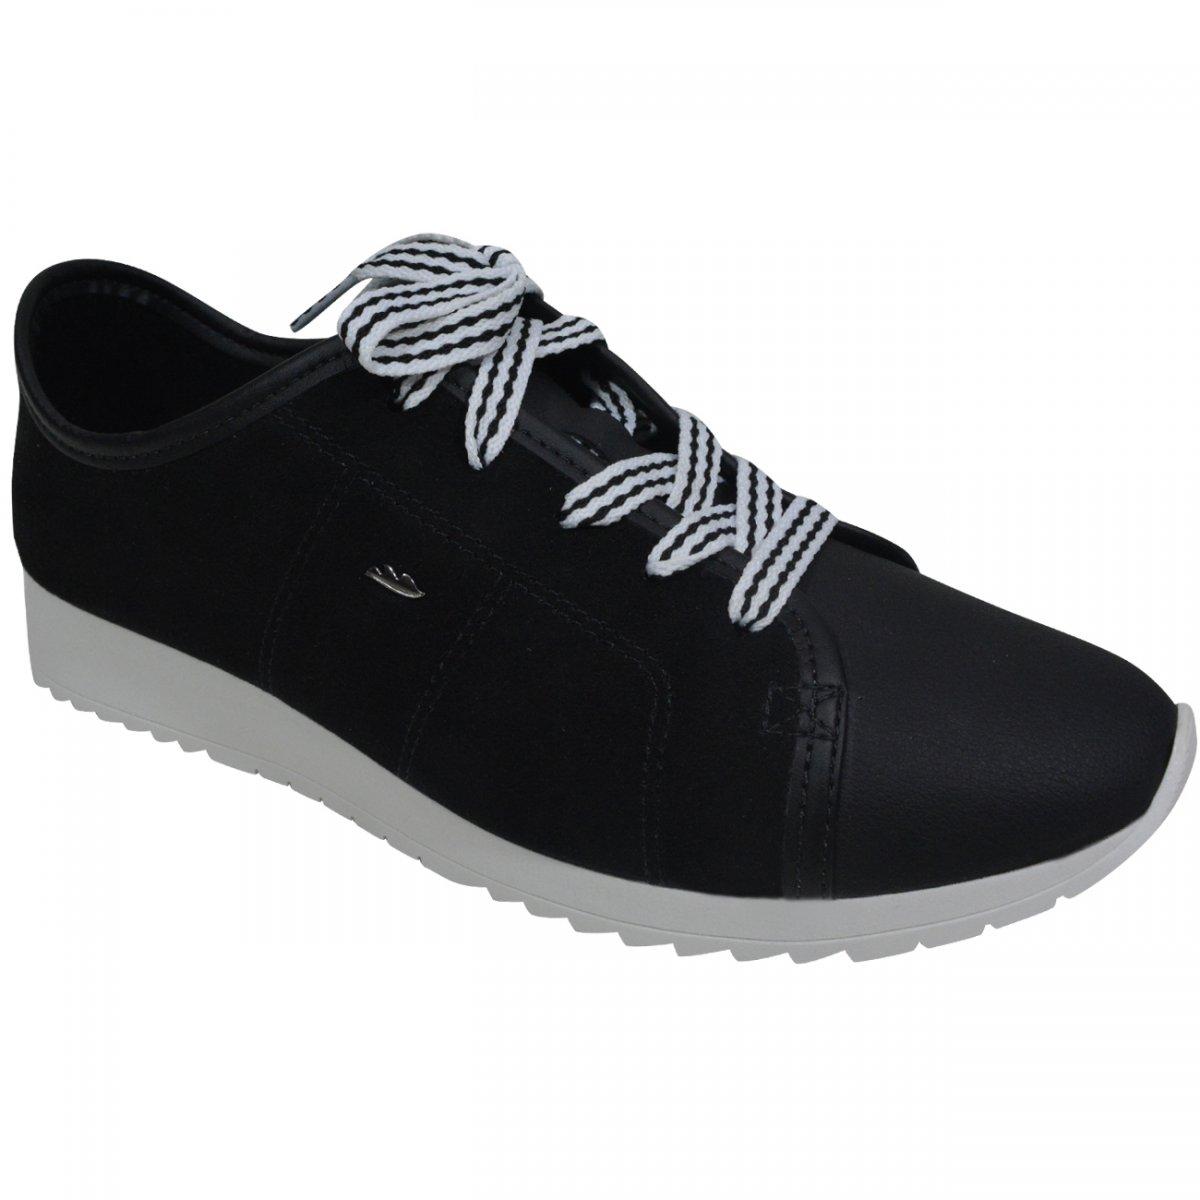 a994f3168d0 Tenis Dakota G0921 G0921 - Preto - Chuteira Nike